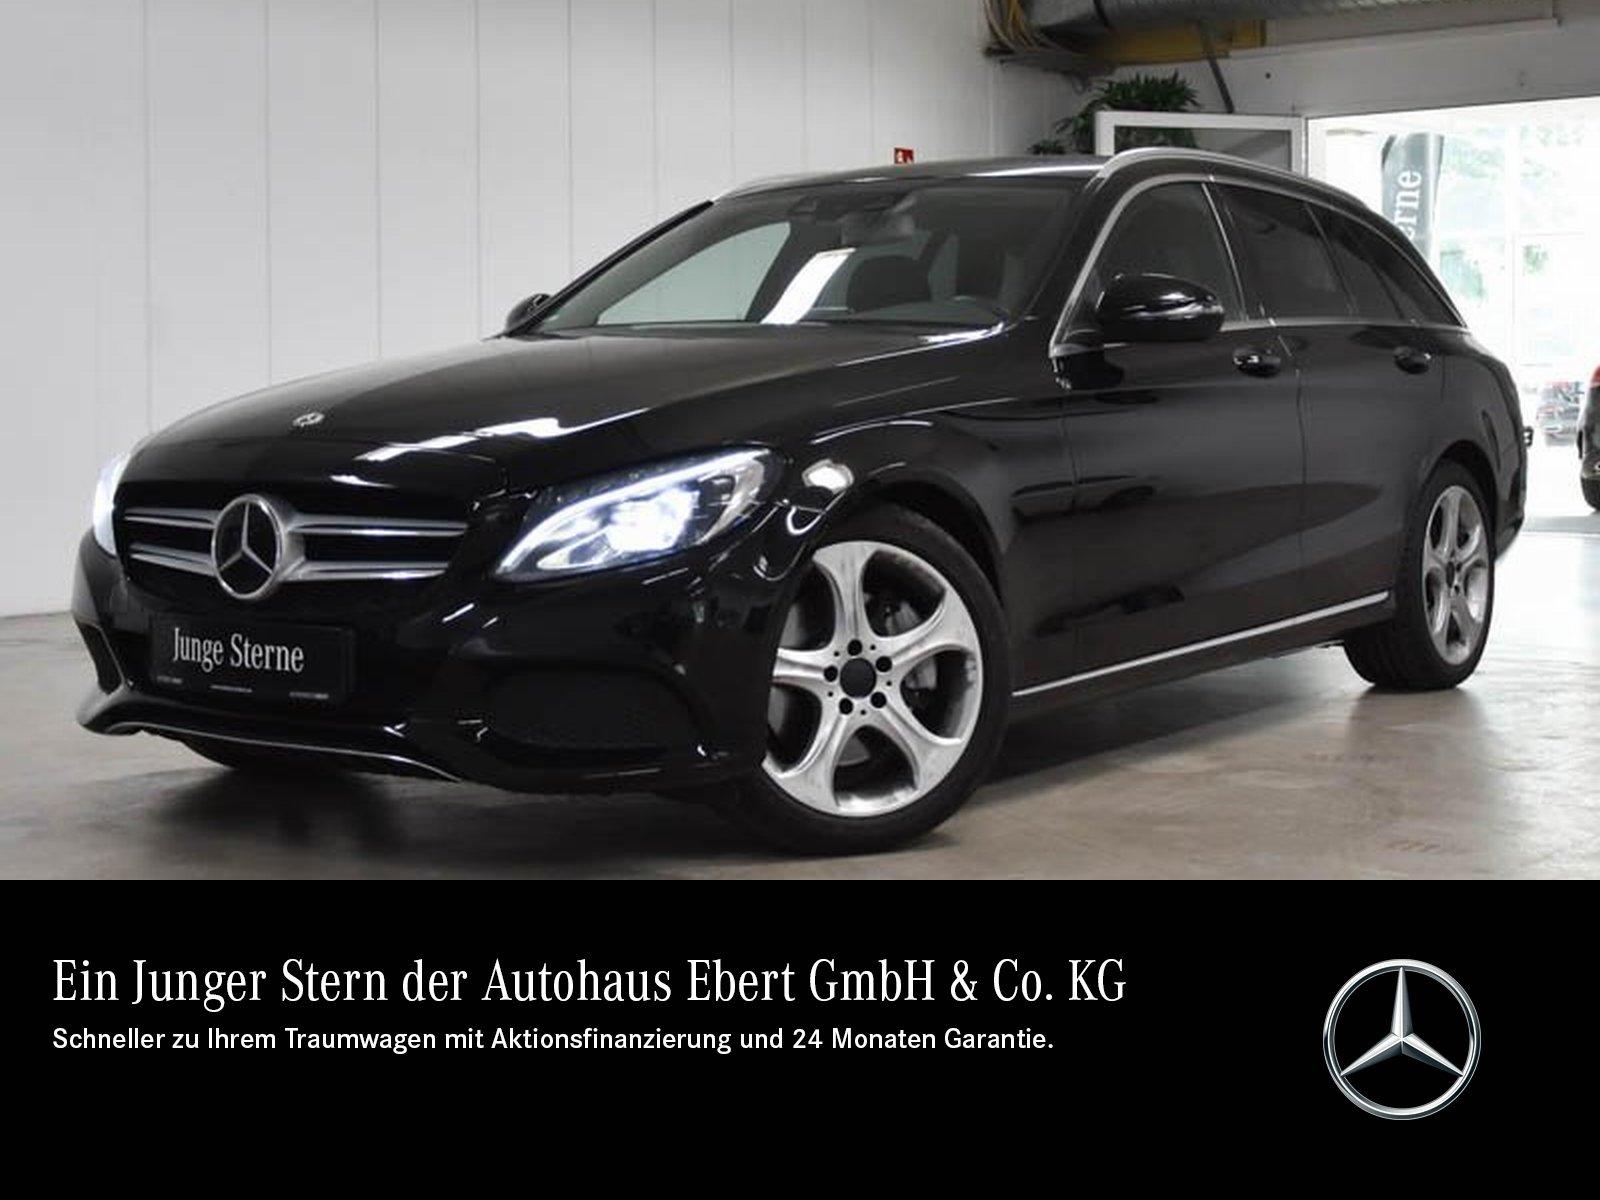 Mercedes-Benz C 300 T Avantgarde COMAND+STDHZG+RFK+AHK+LED, Jahr 2018, Benzin